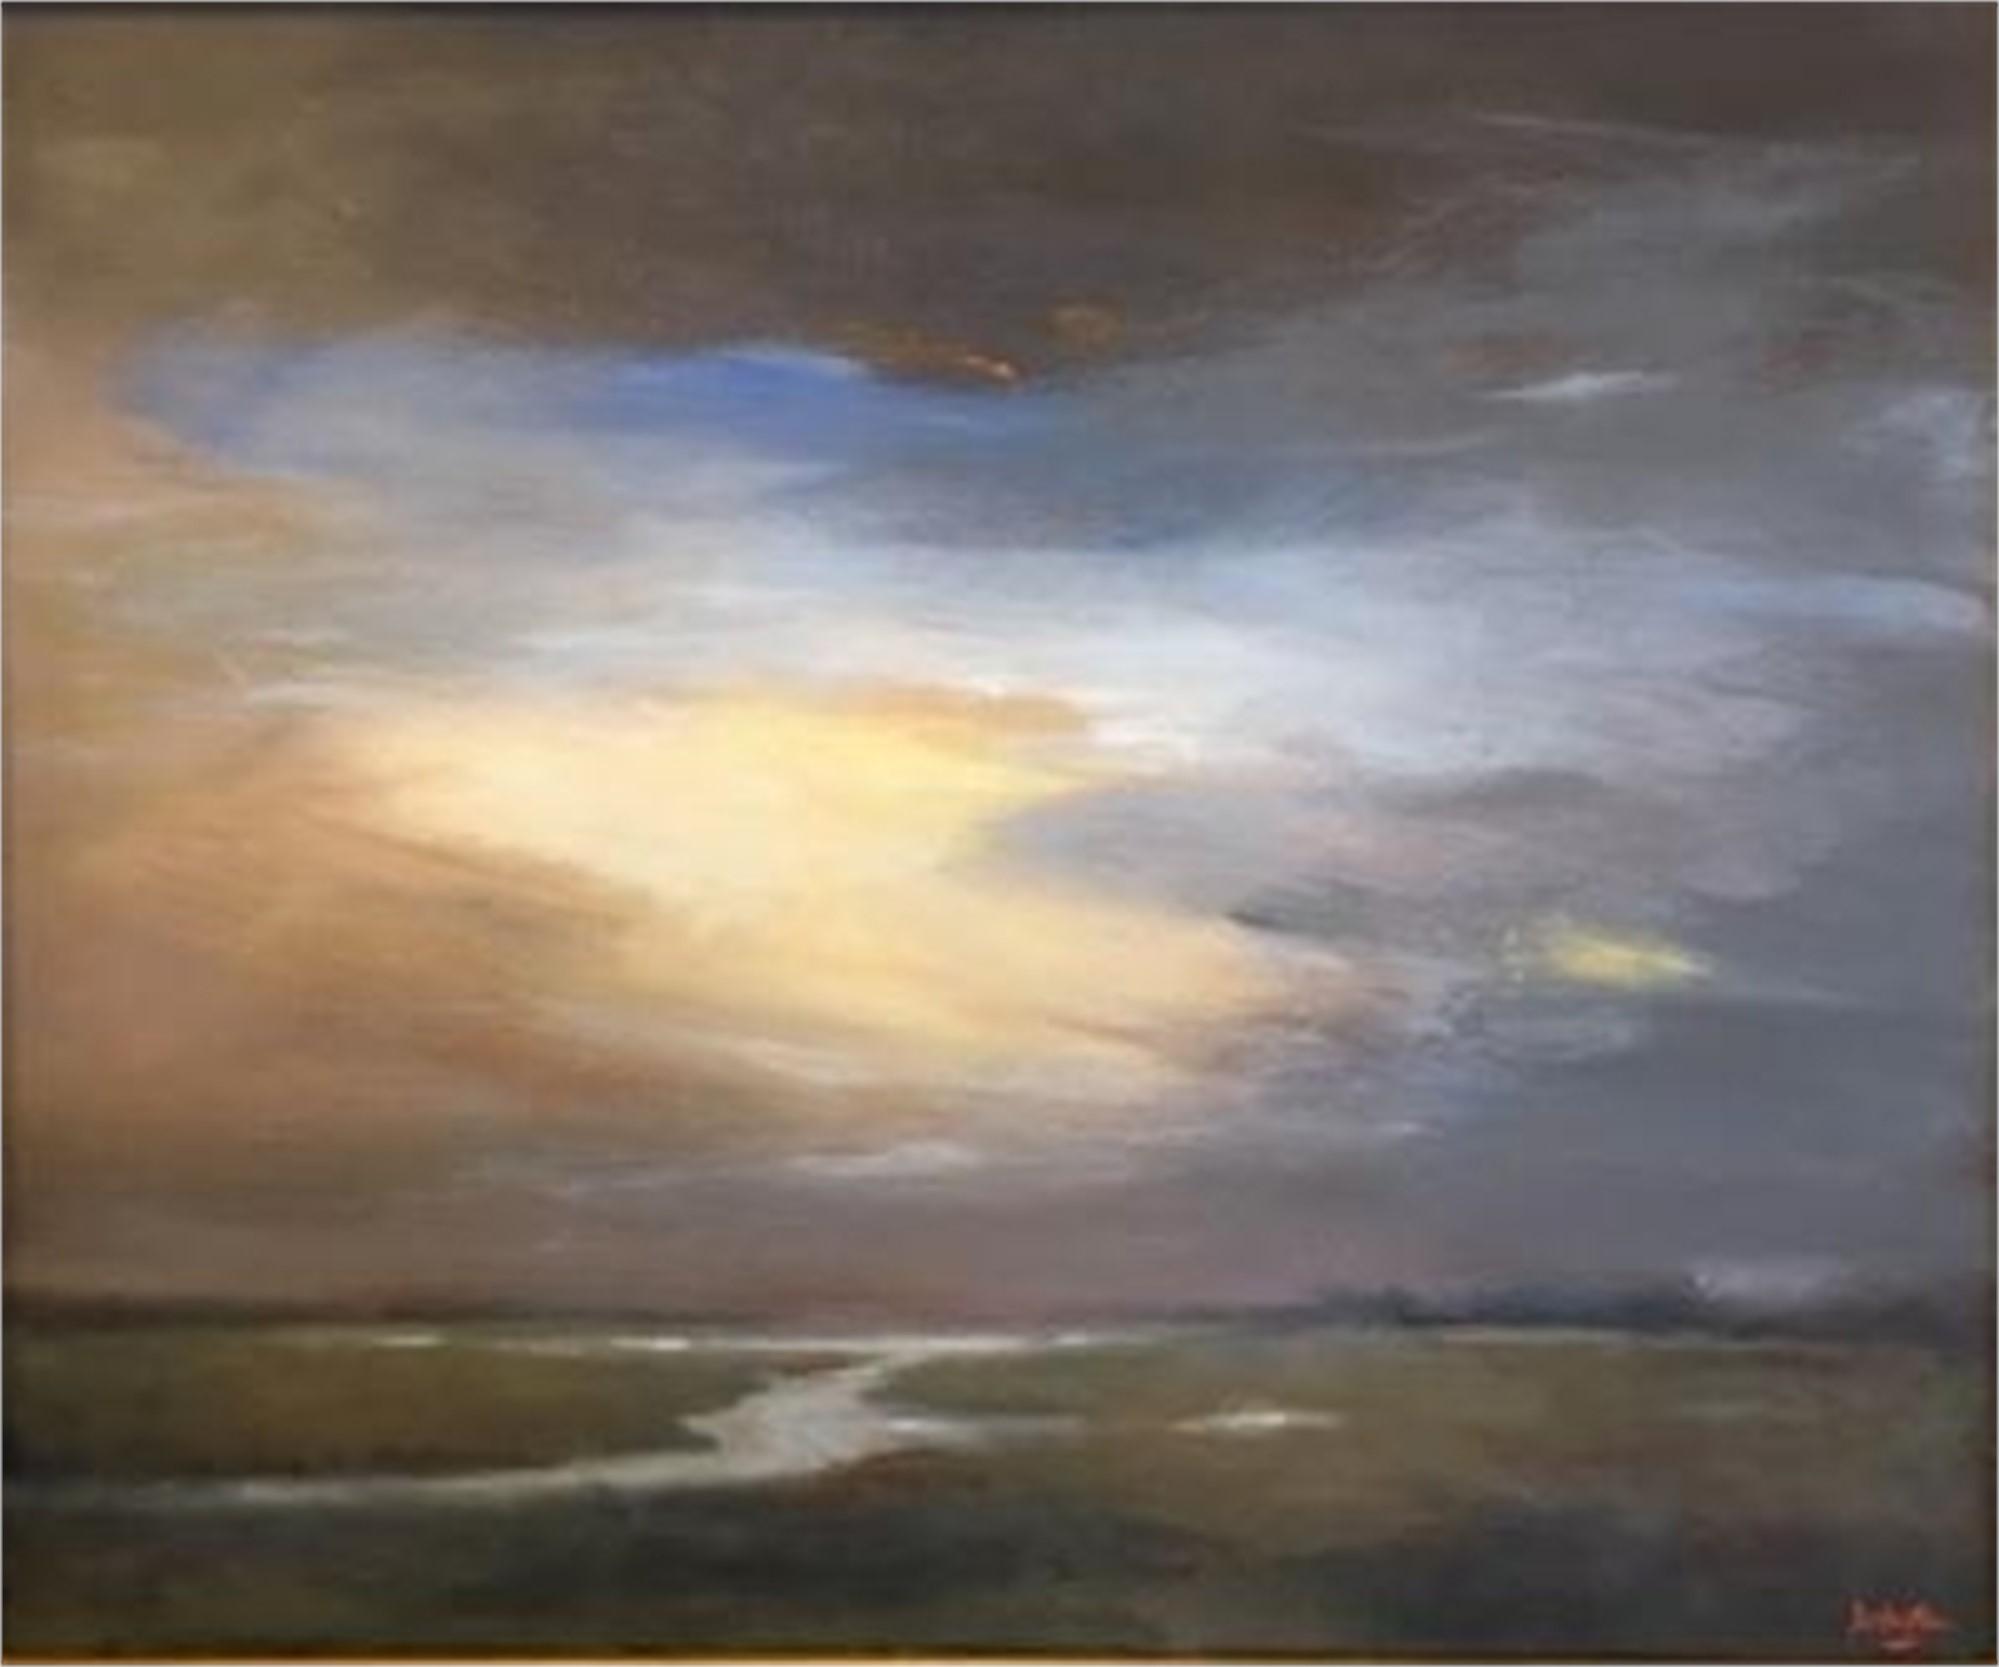 Evening Over Marsh by Jim Darlington